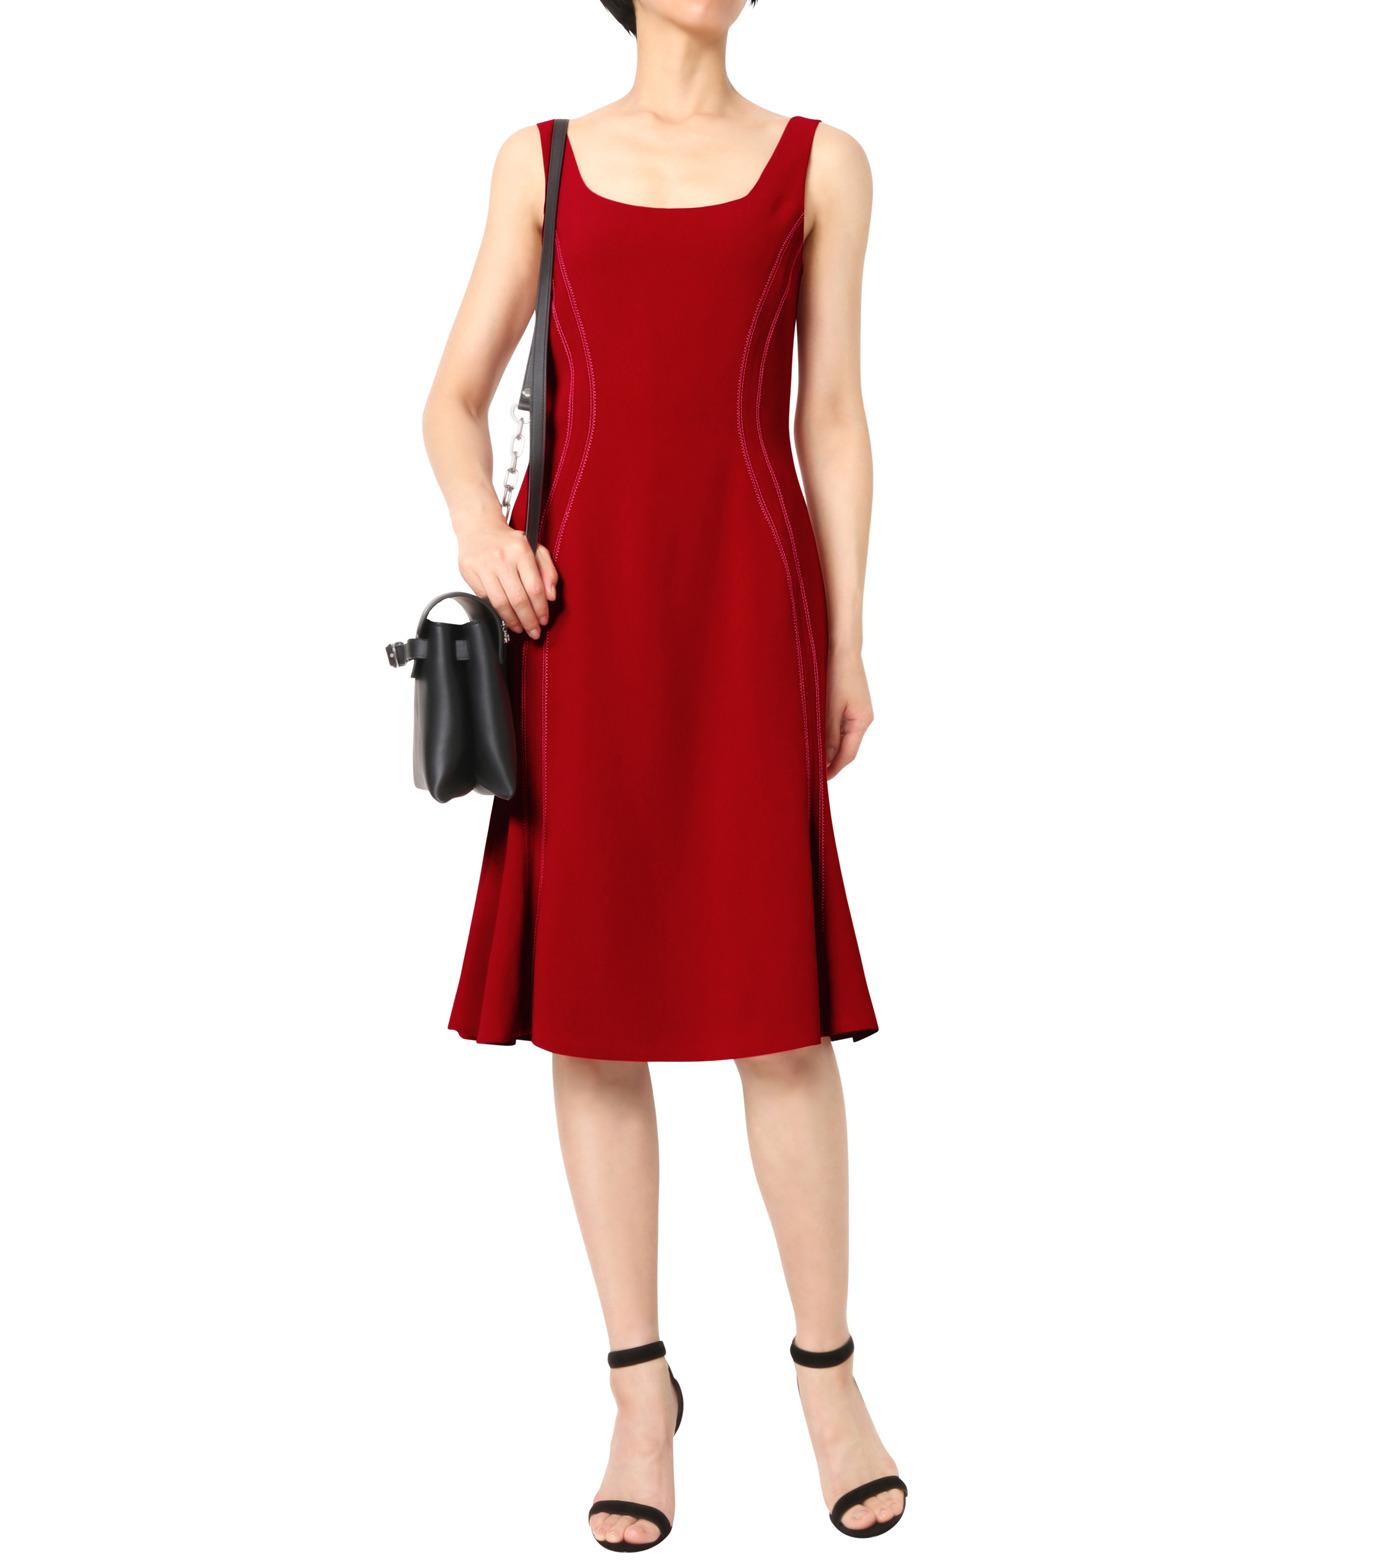 Altuzarra(アルトゥザラ)のStitched Detail Dress-RED(ワンピース/one piece)-316-317-89-62 拡大詳細画像1